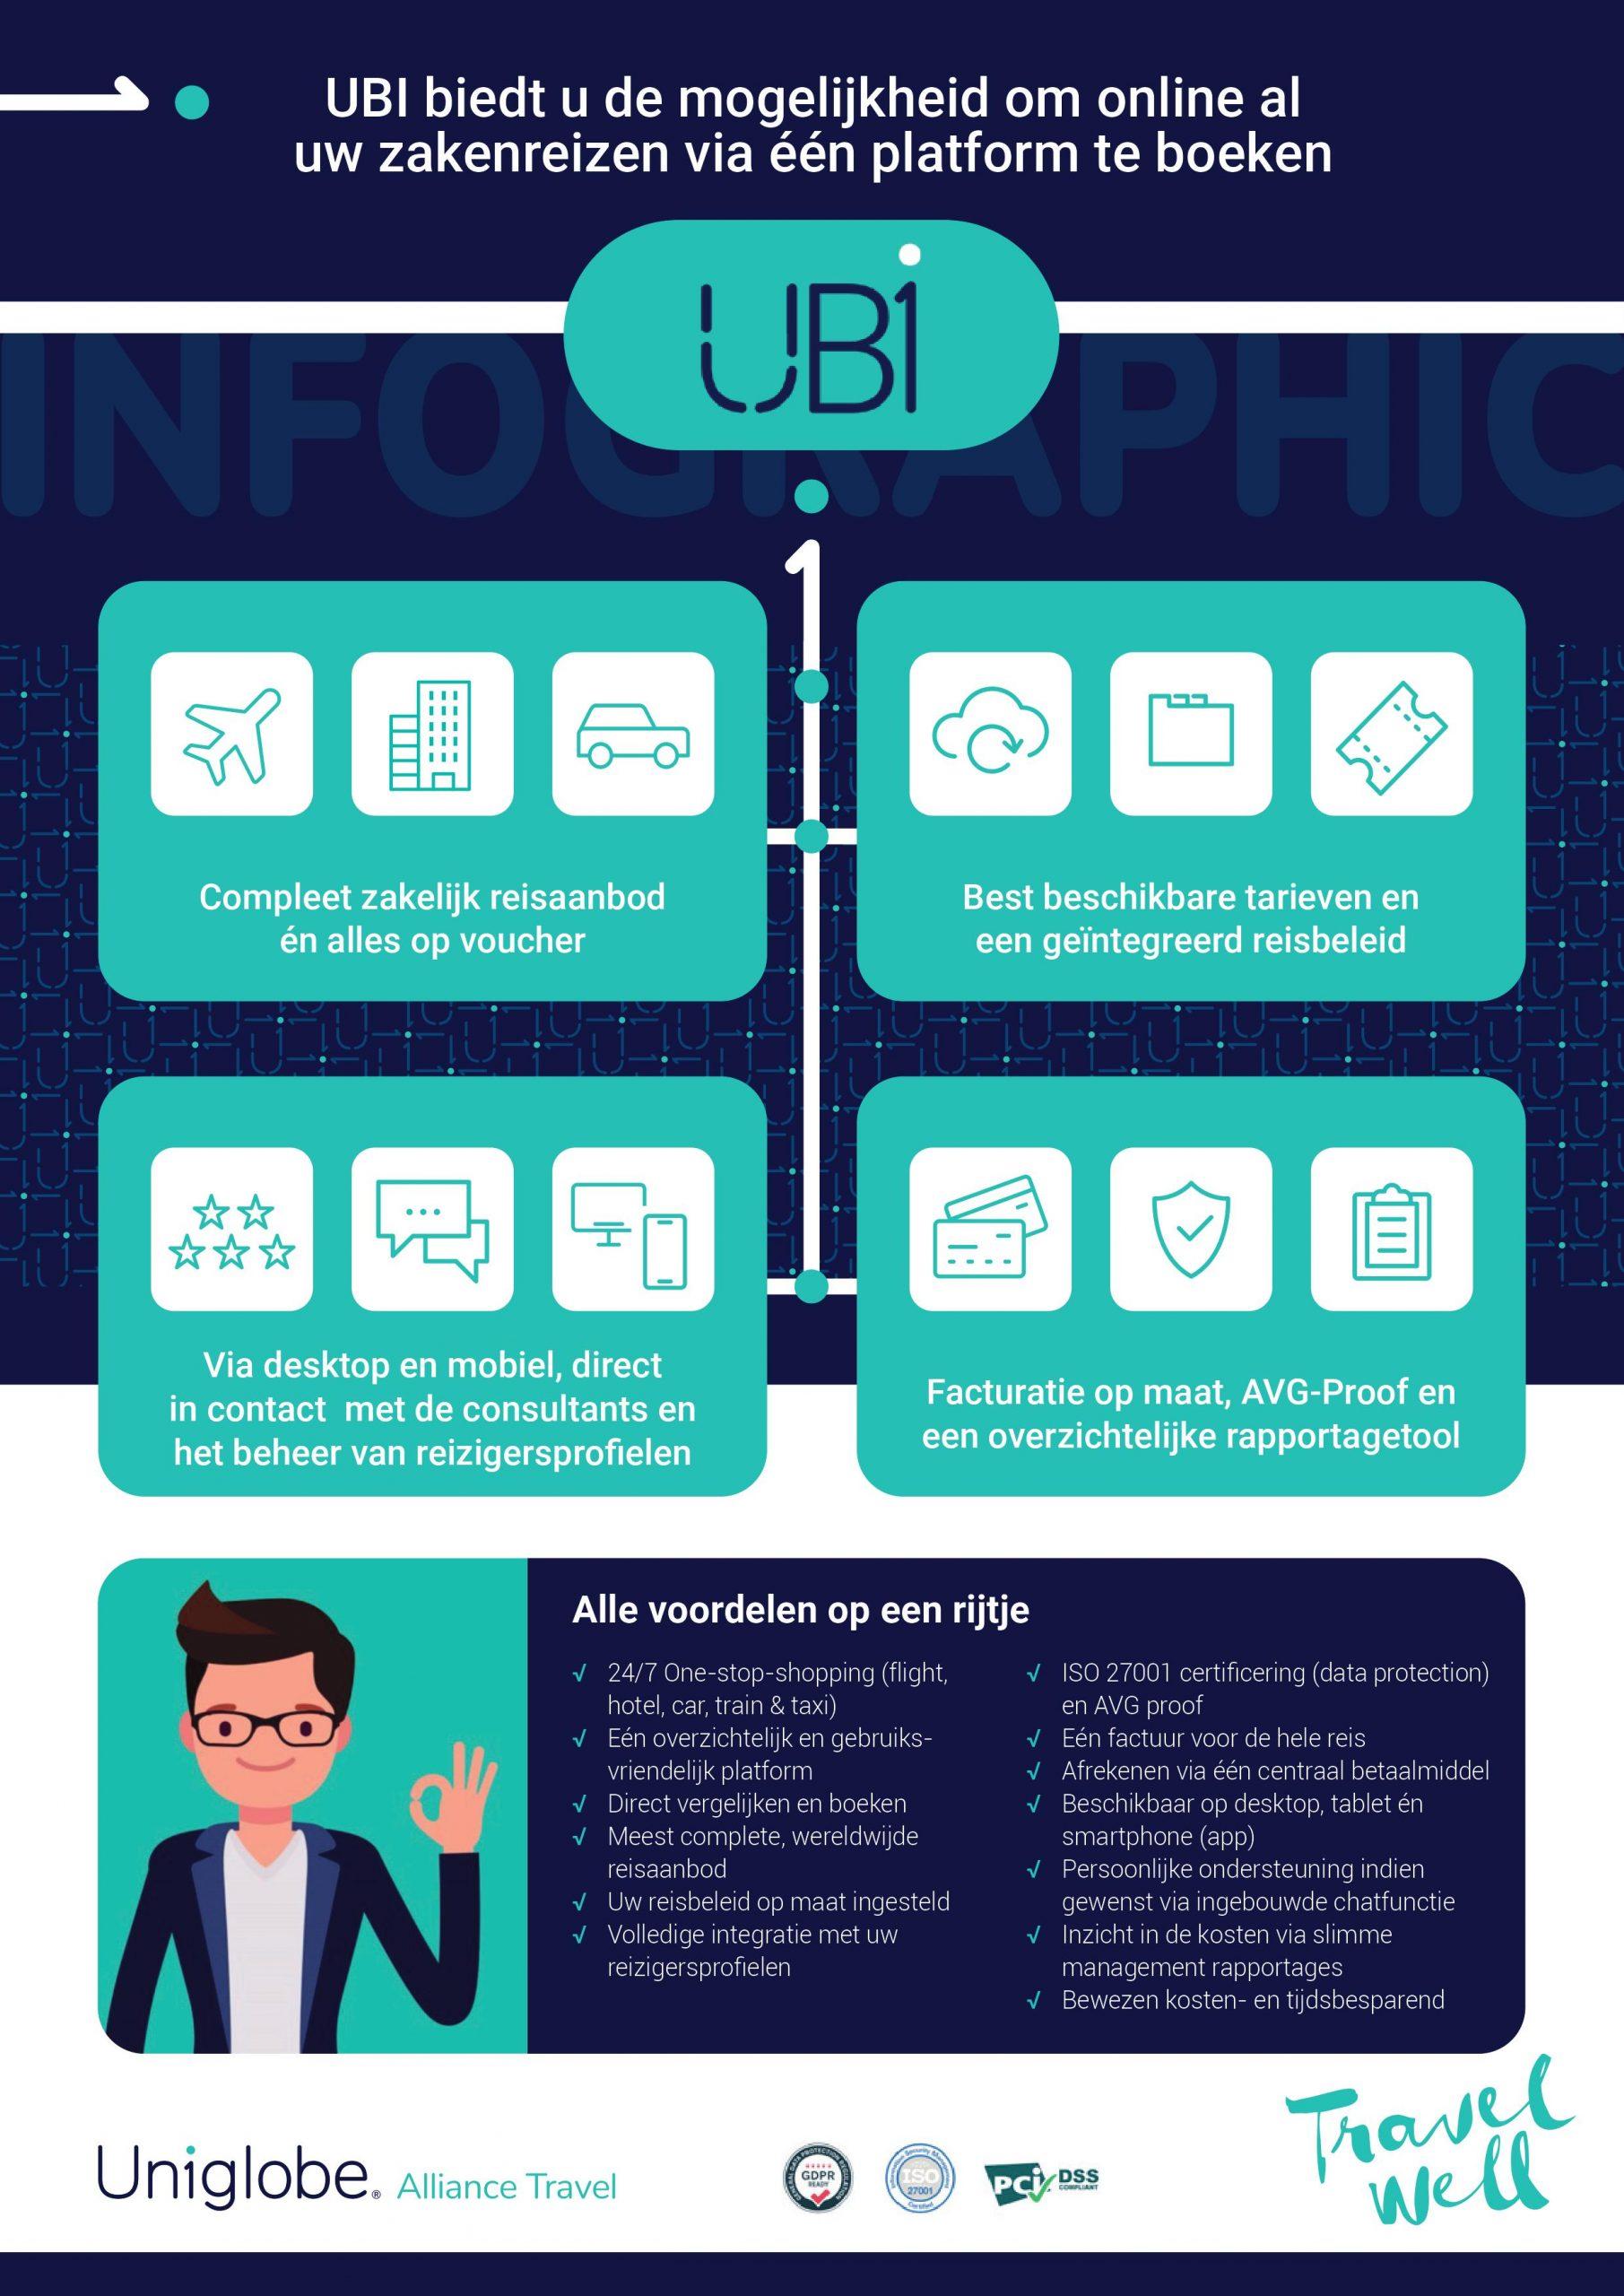 ubi-infographic-def-jpg